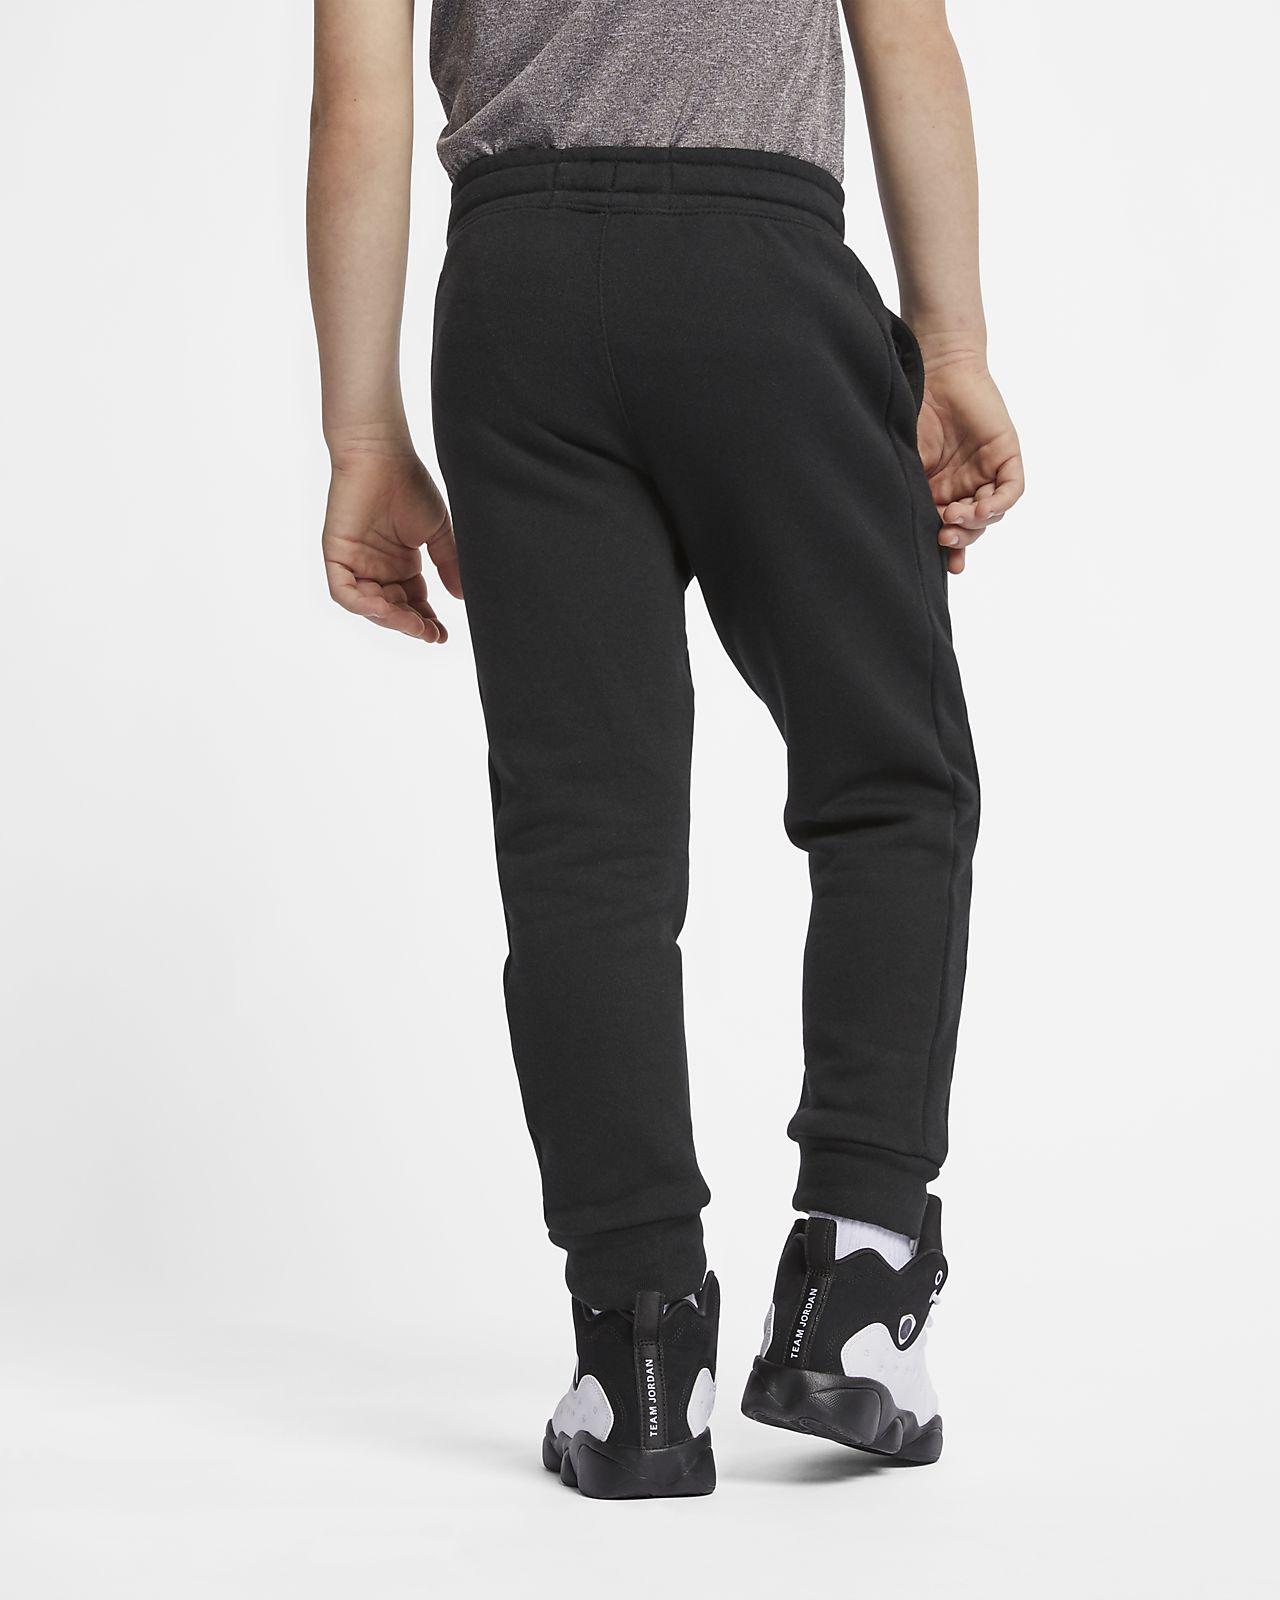 1445ce834be8 Jordan Flight Lite Younger Kids  Trousers. Nike.com GB